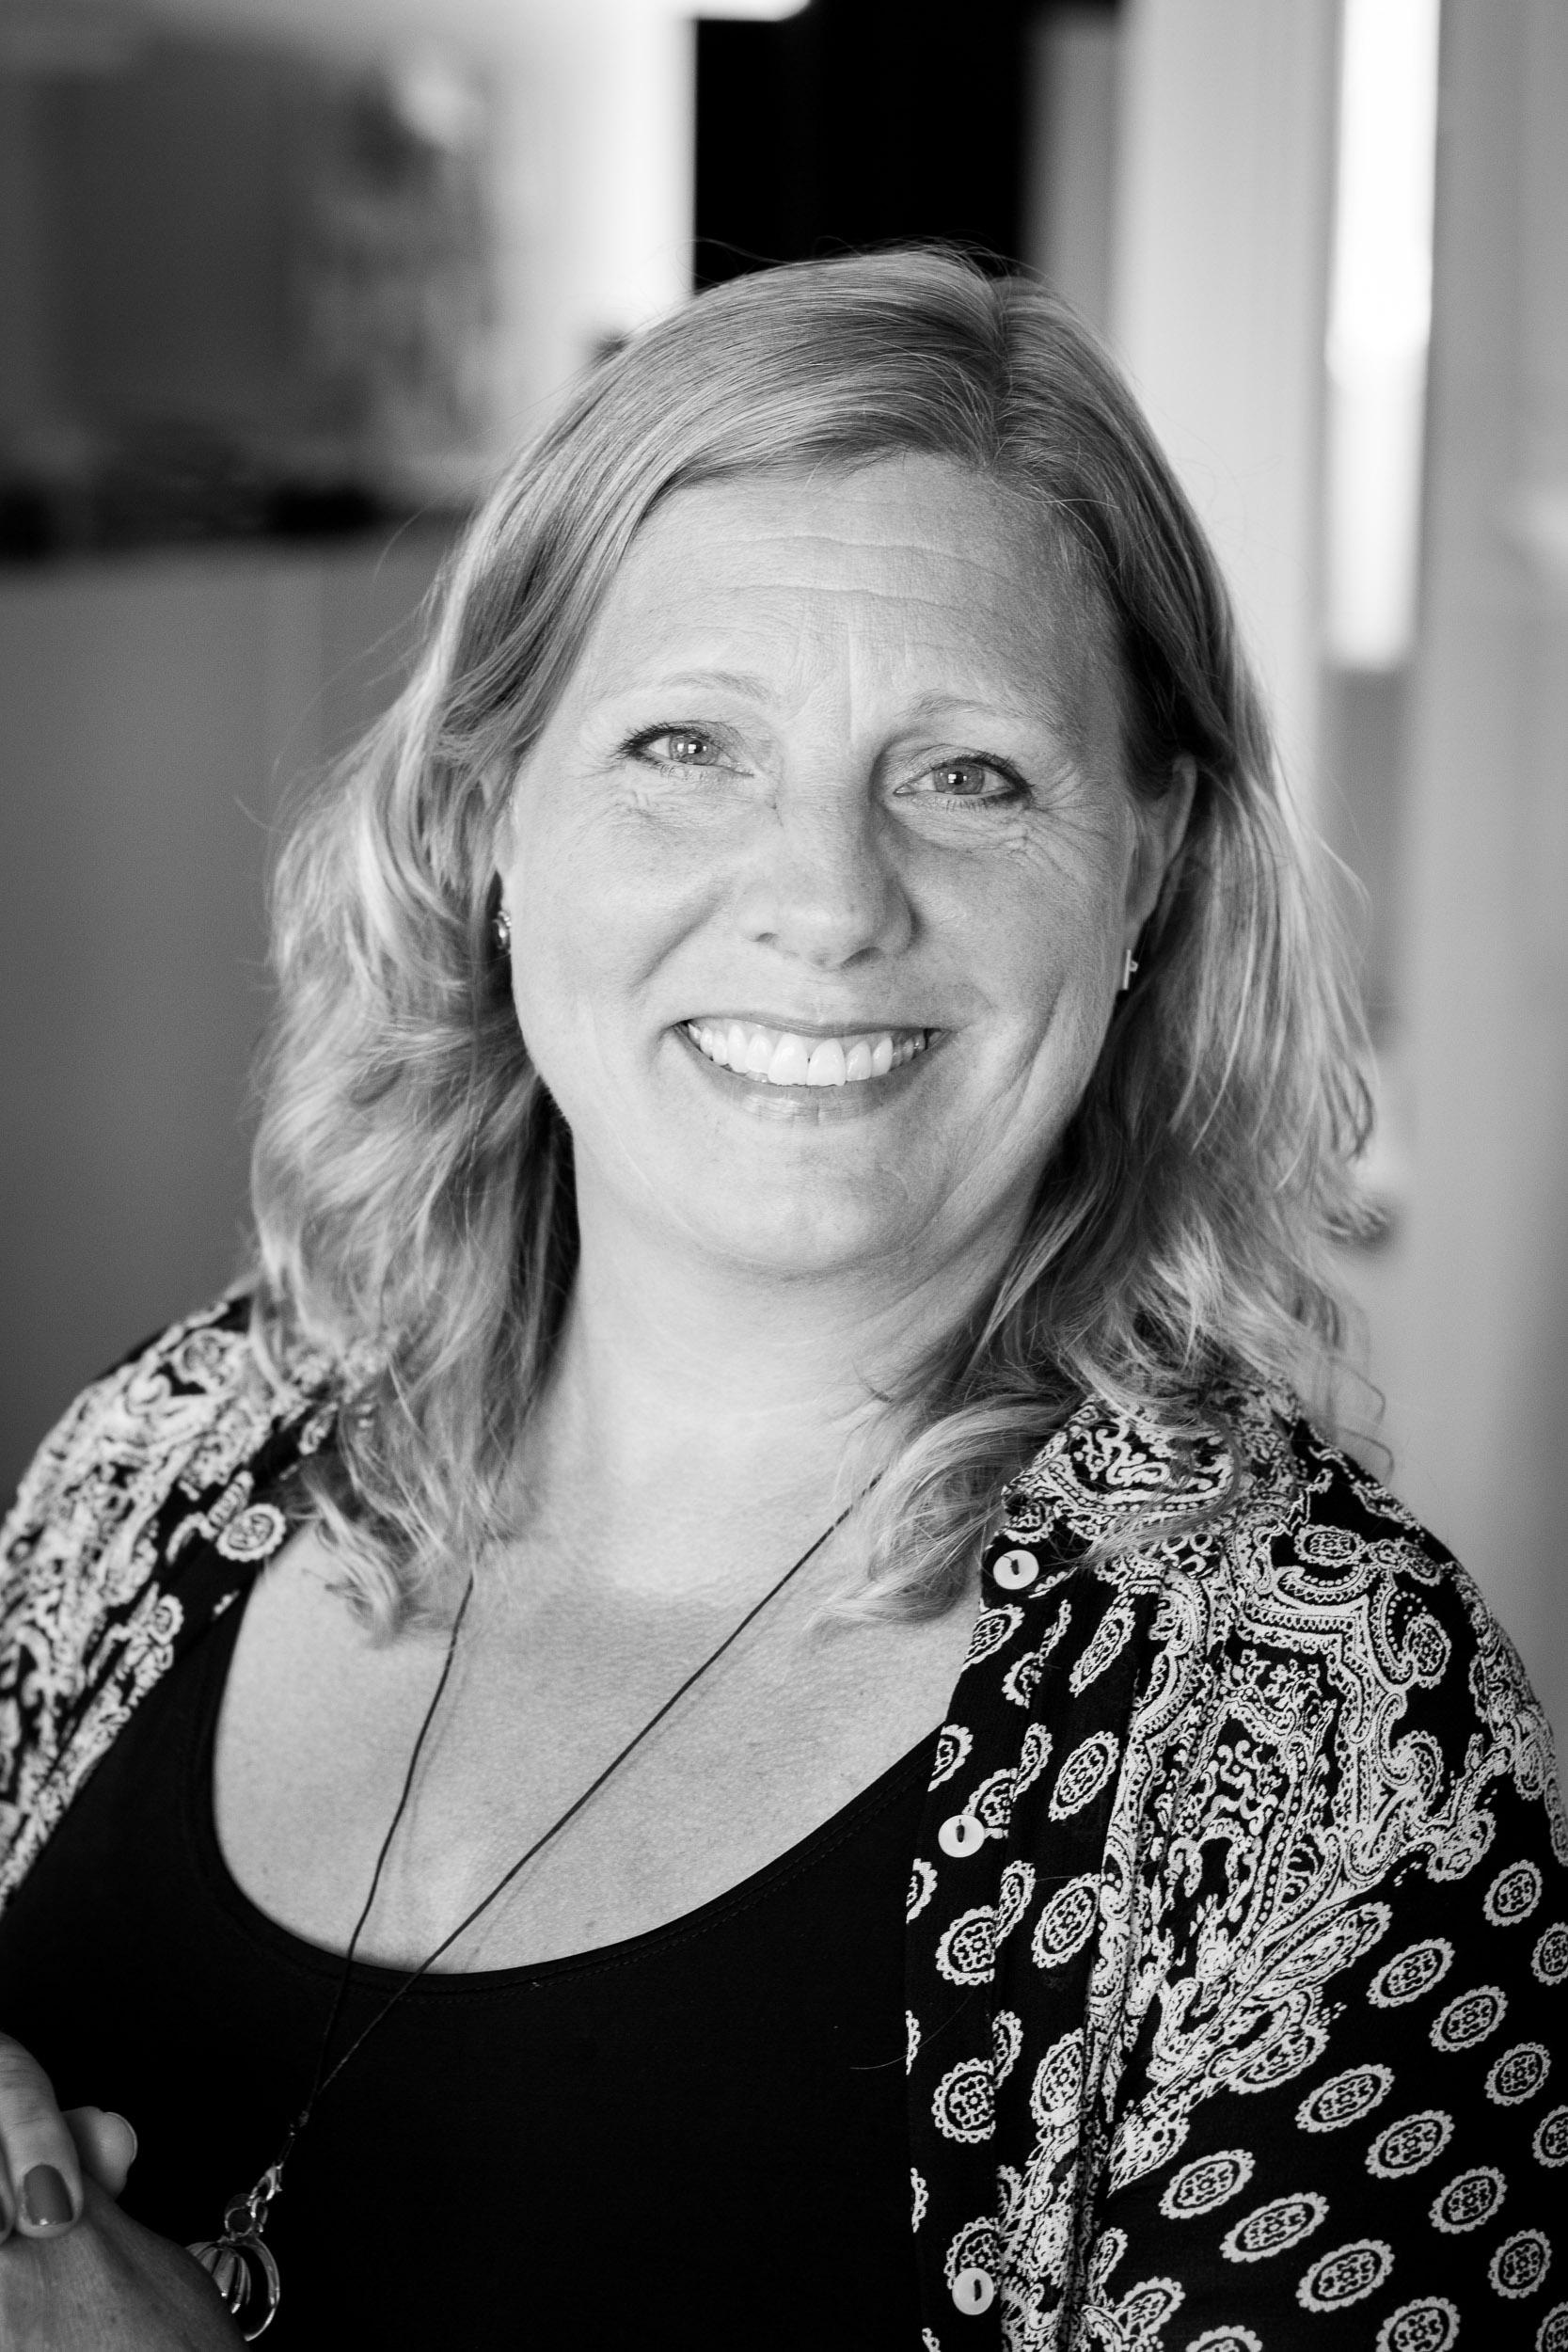 Lisa Sjöström